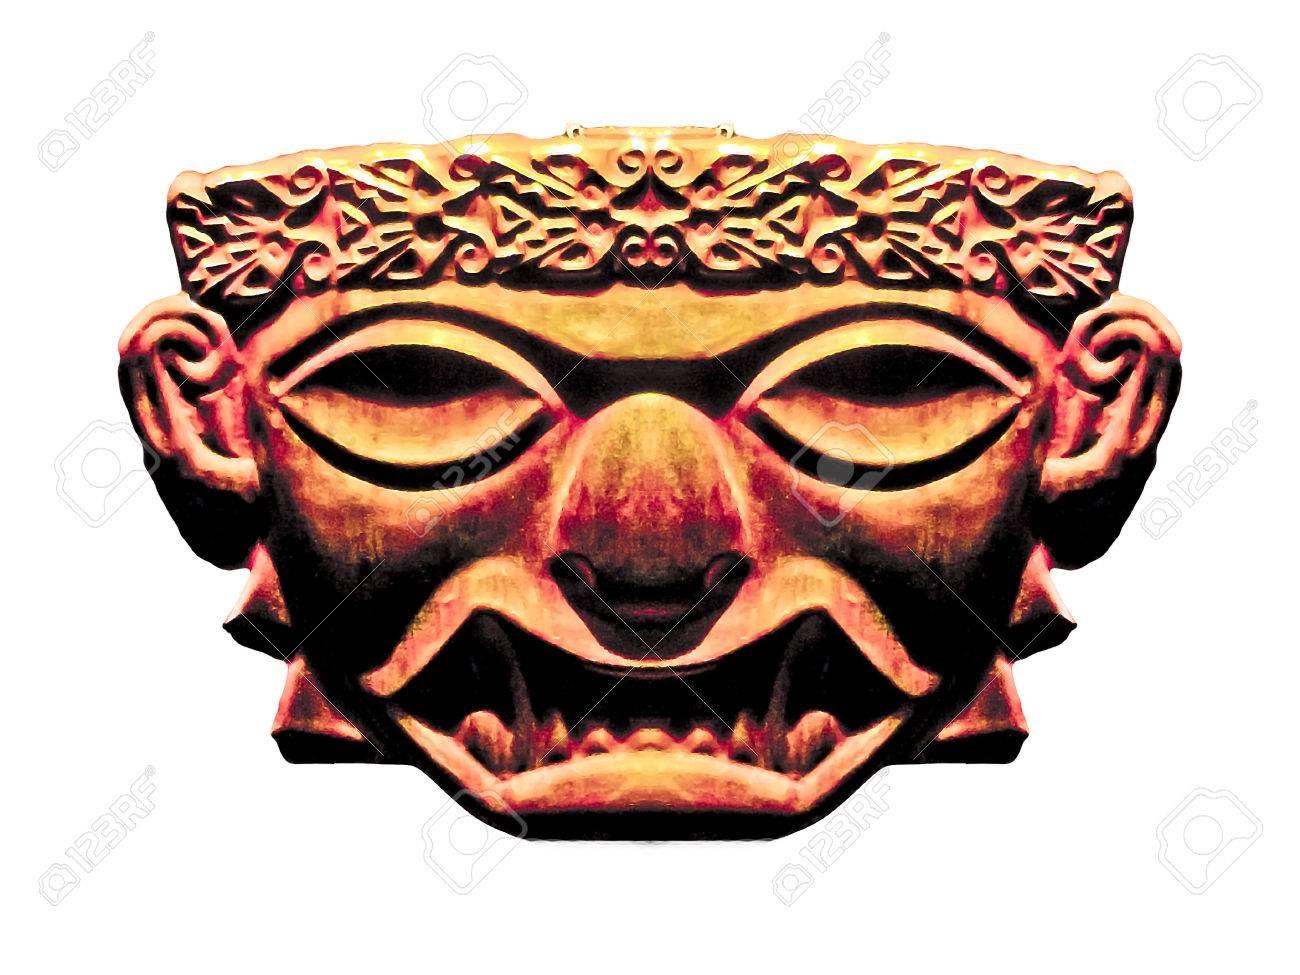 Digital edited and manipulated ancient inca civilization religious